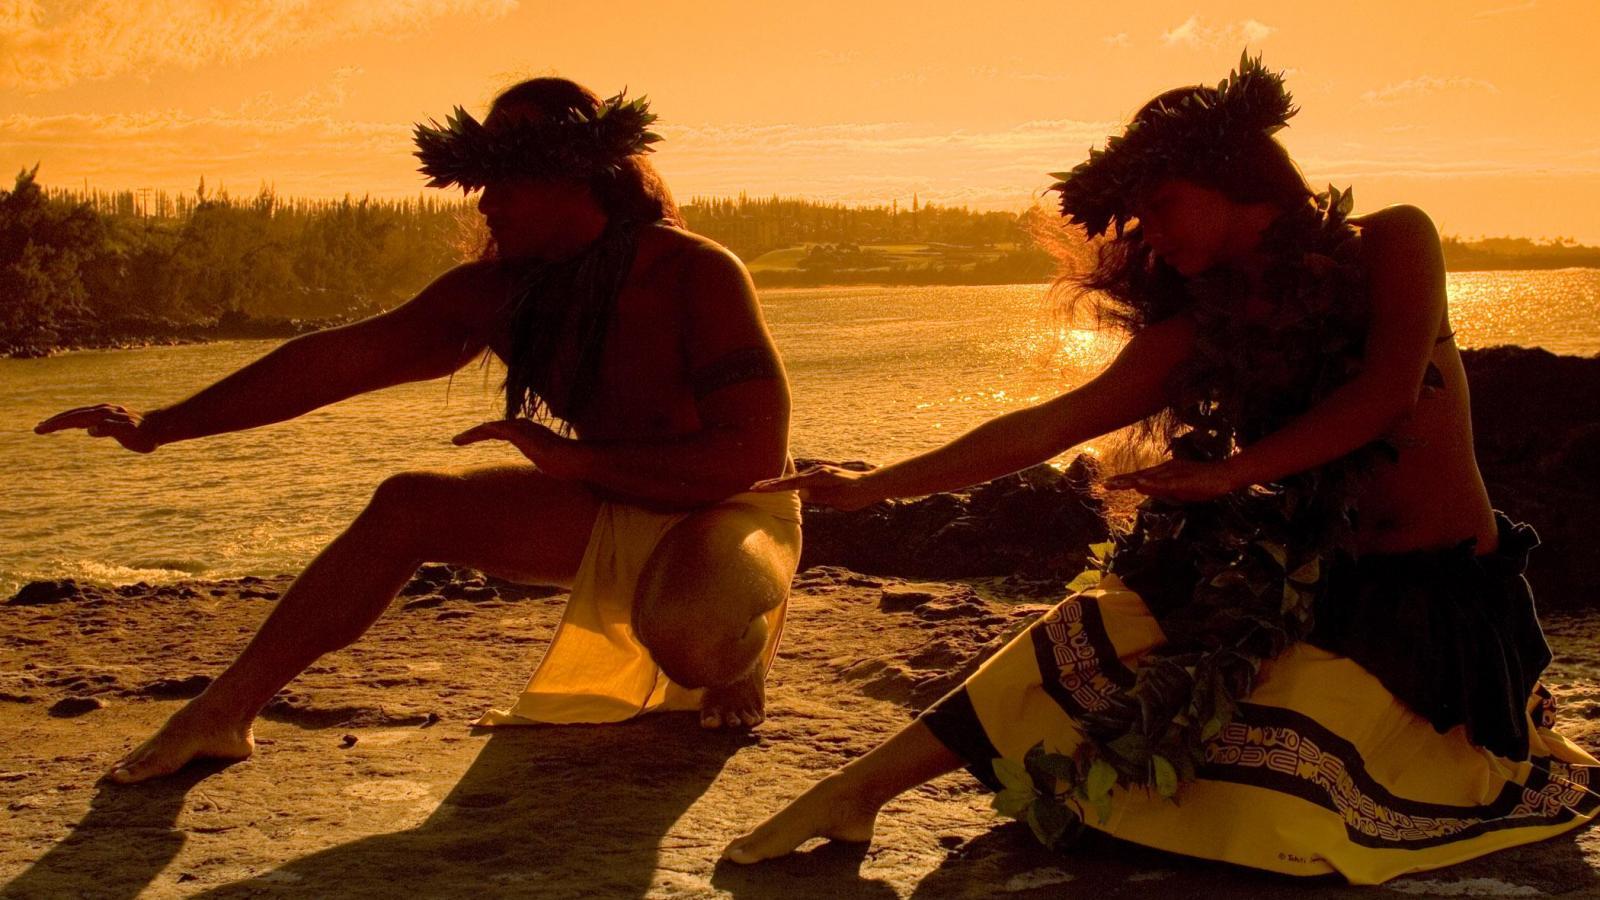 Hawaiian dancers on beach at sunset hawaii HQ WALLPAPER - (#130757)